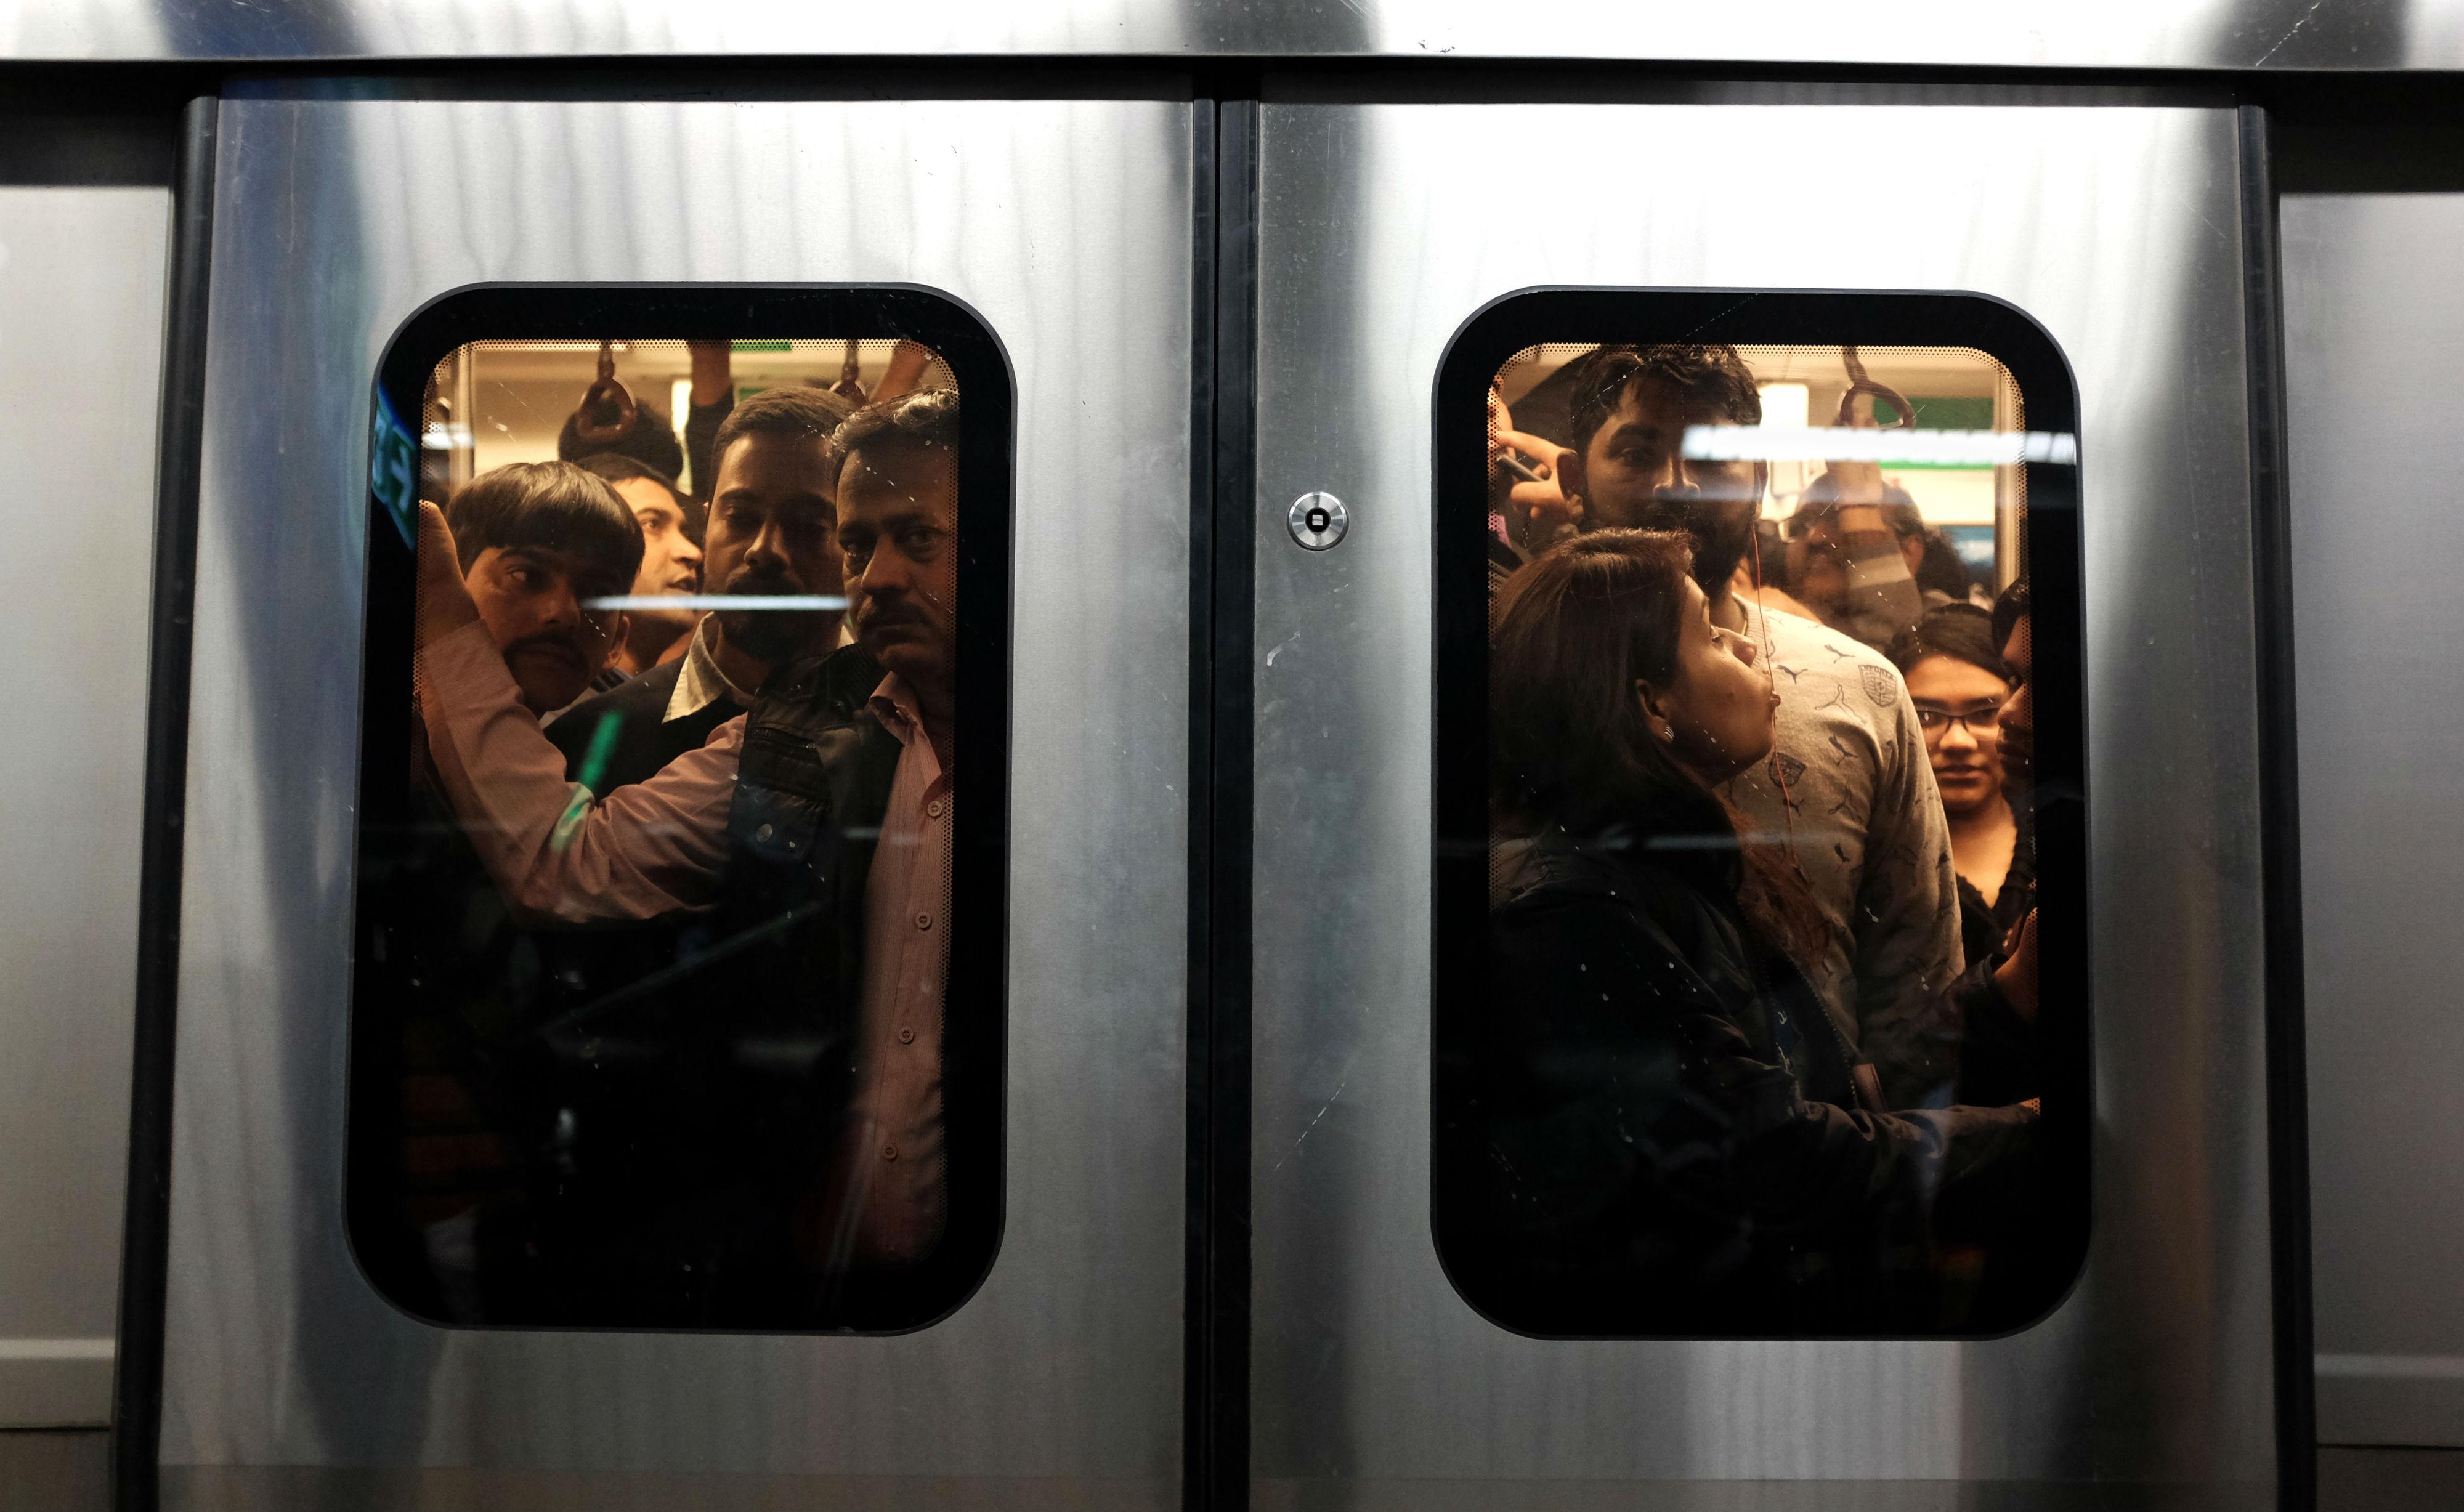 Rush hour in Delhi Metro